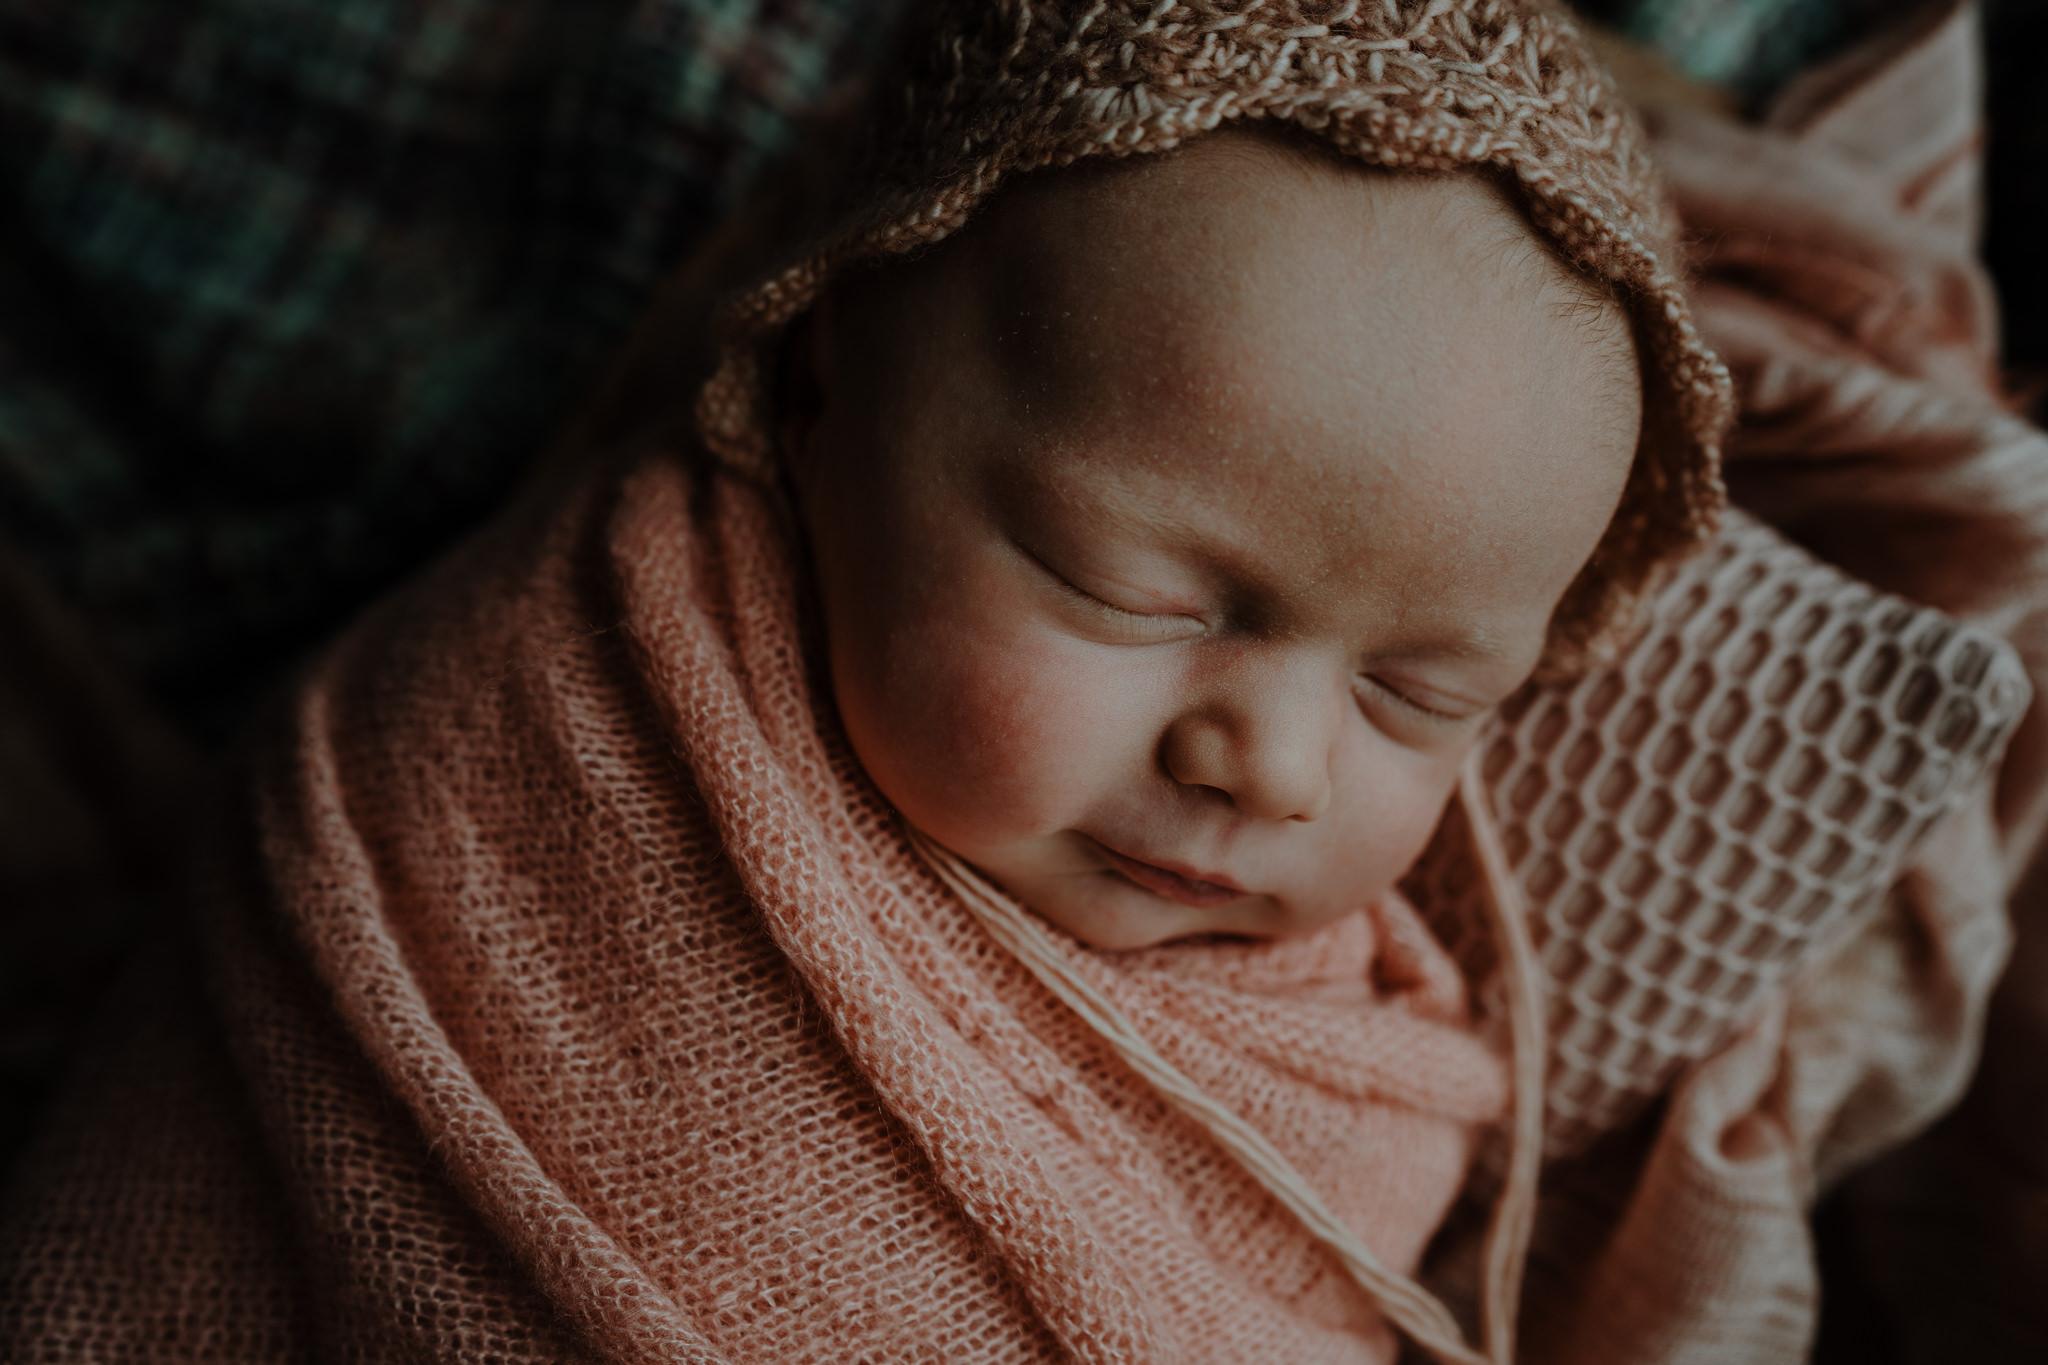 newborn-photographer-belfast-the-snug-sessions-Nora-5.jpg